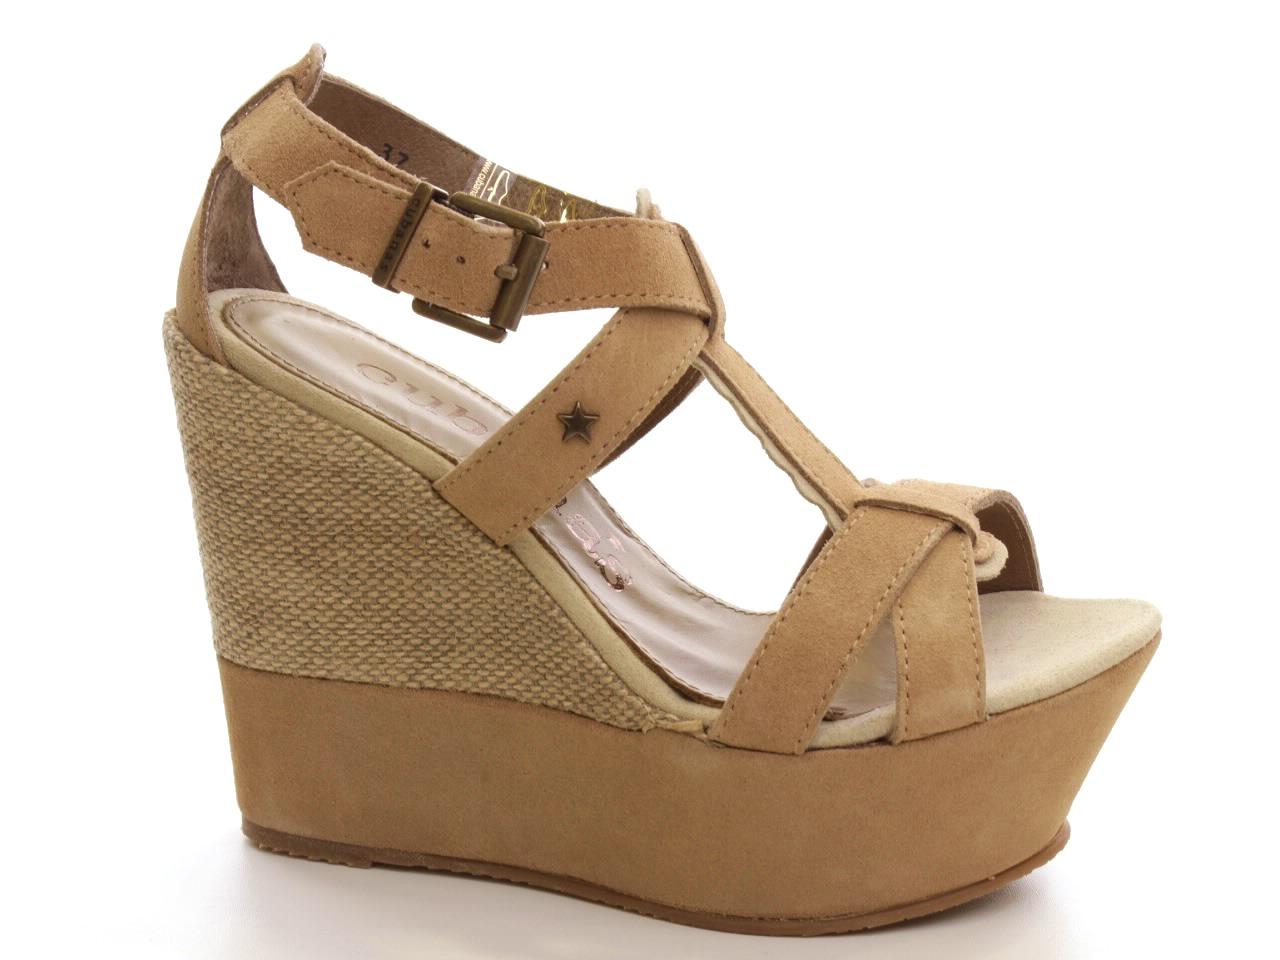 Wedge Sandals Cubanas - 334 SLIM410